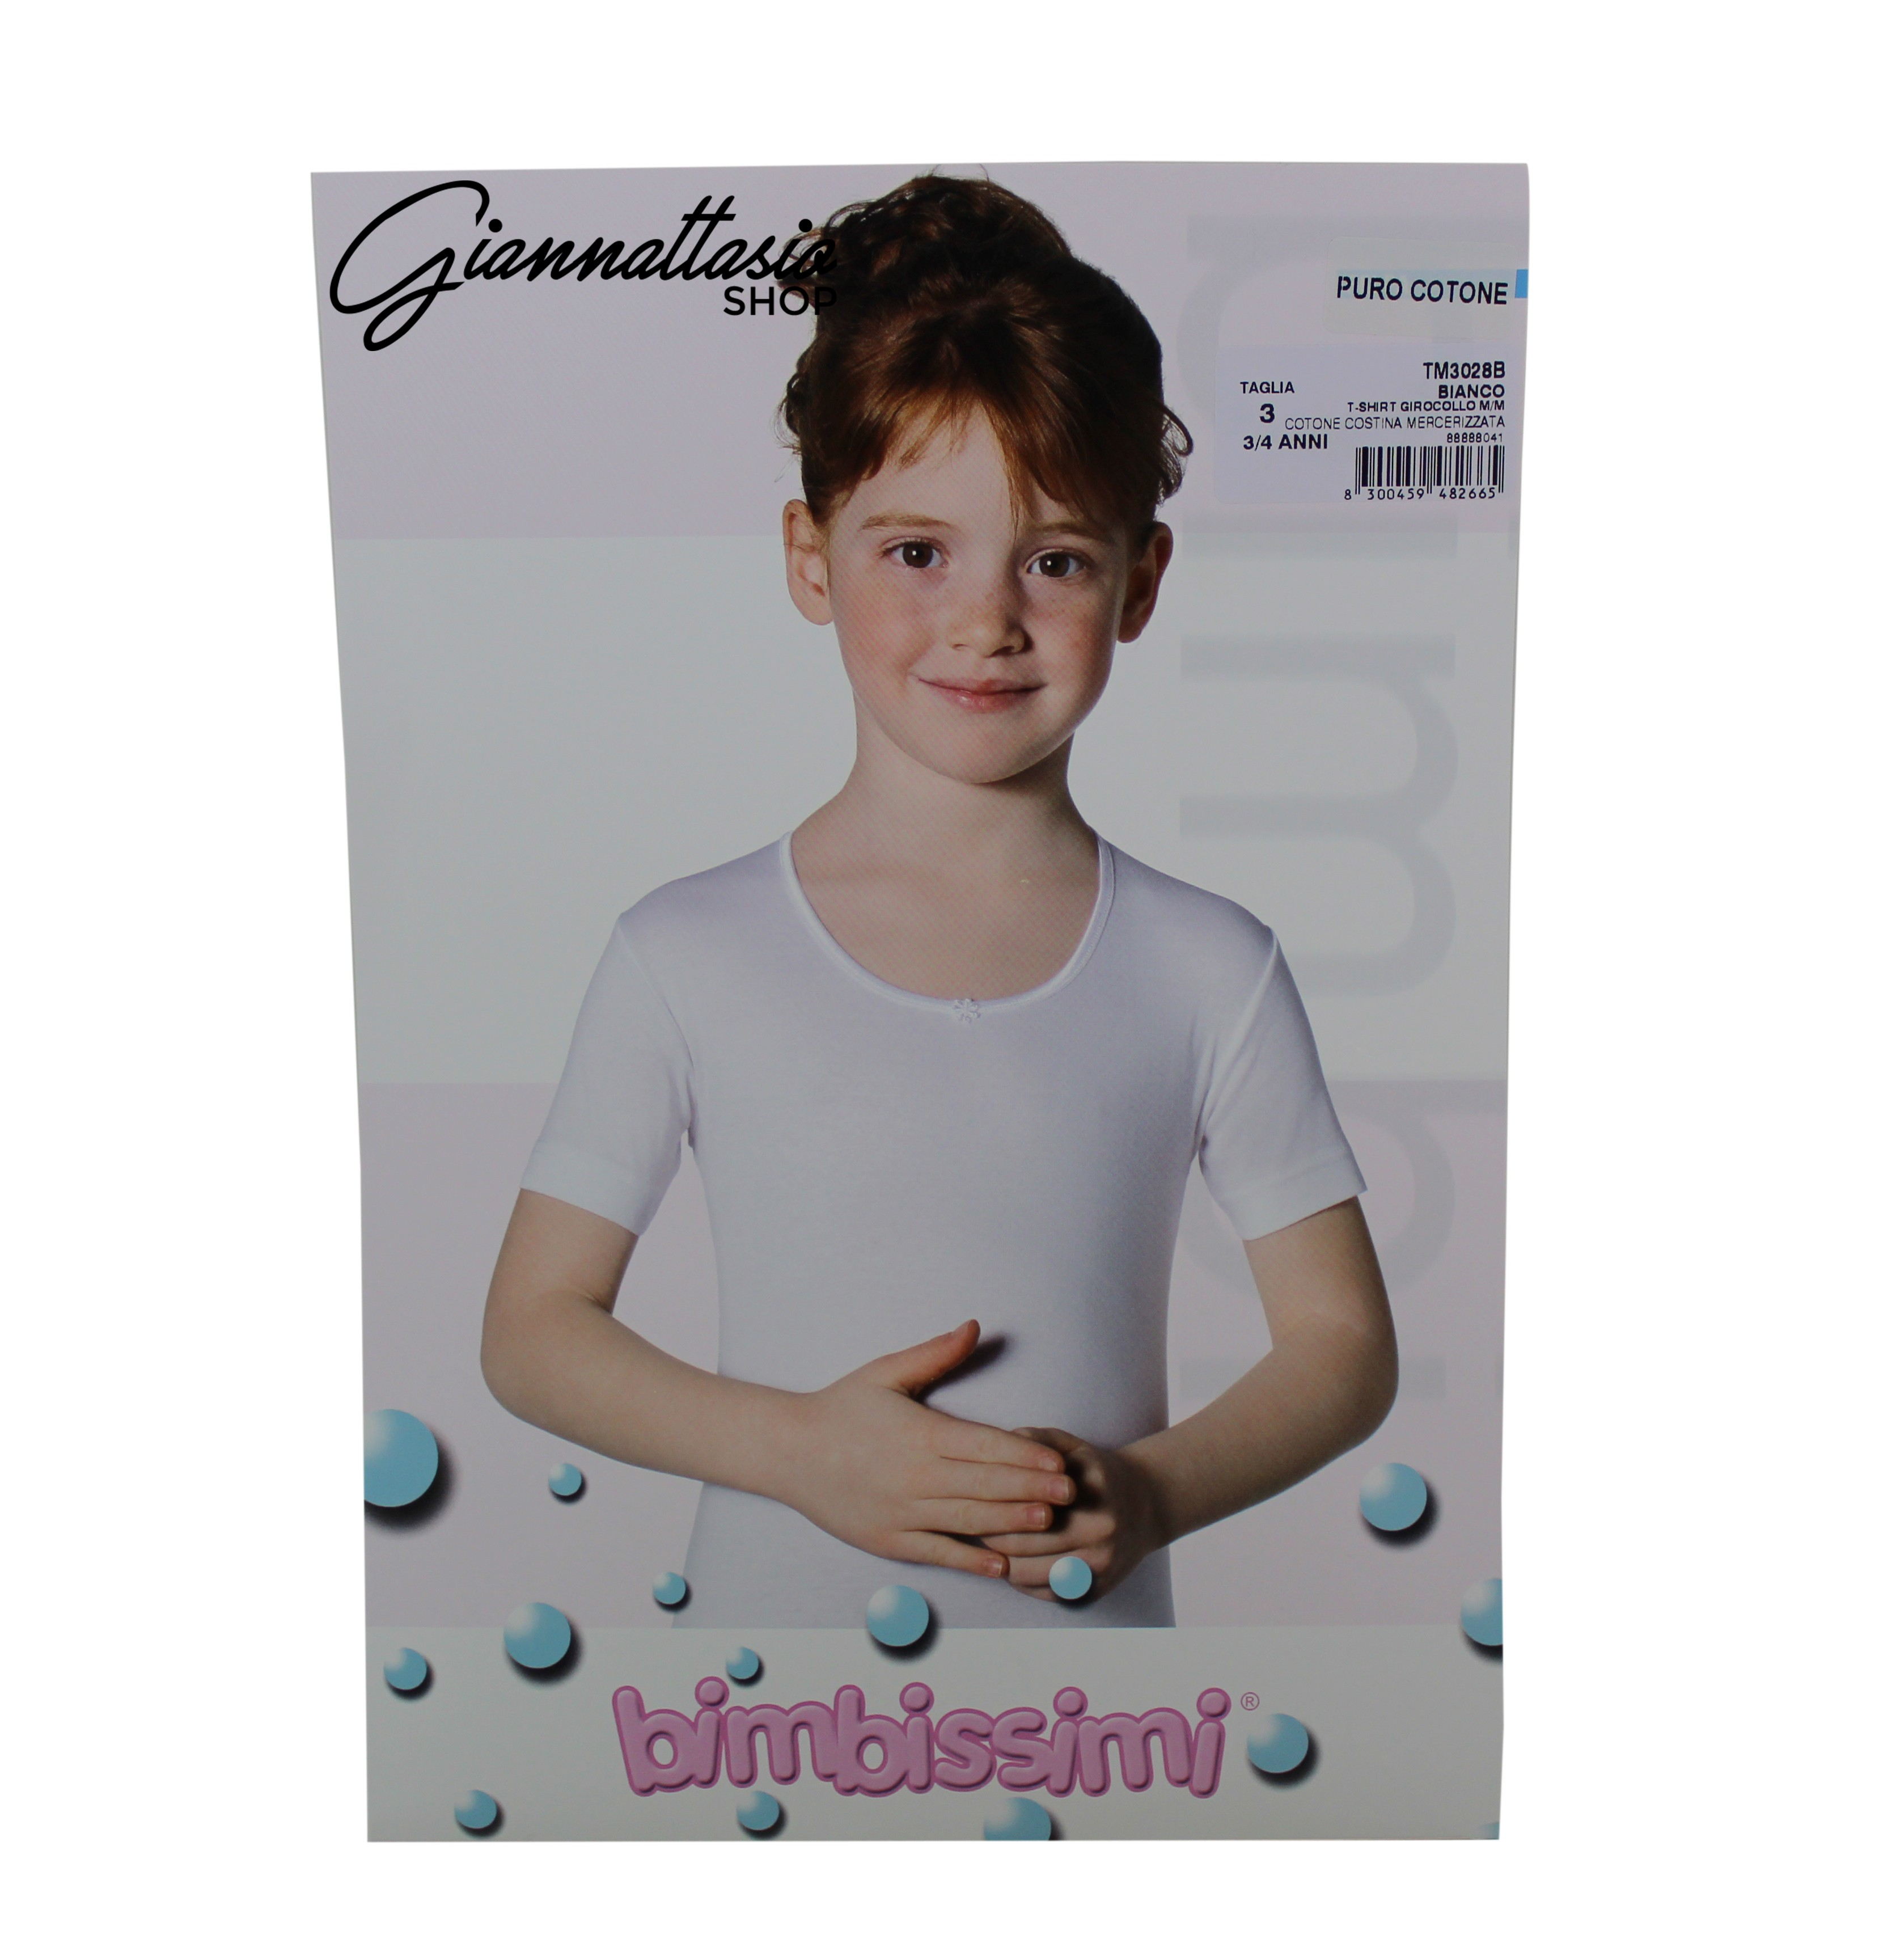 ff2abe1c00 Nottingham Bambina TM3028 - Giannattasio Shop